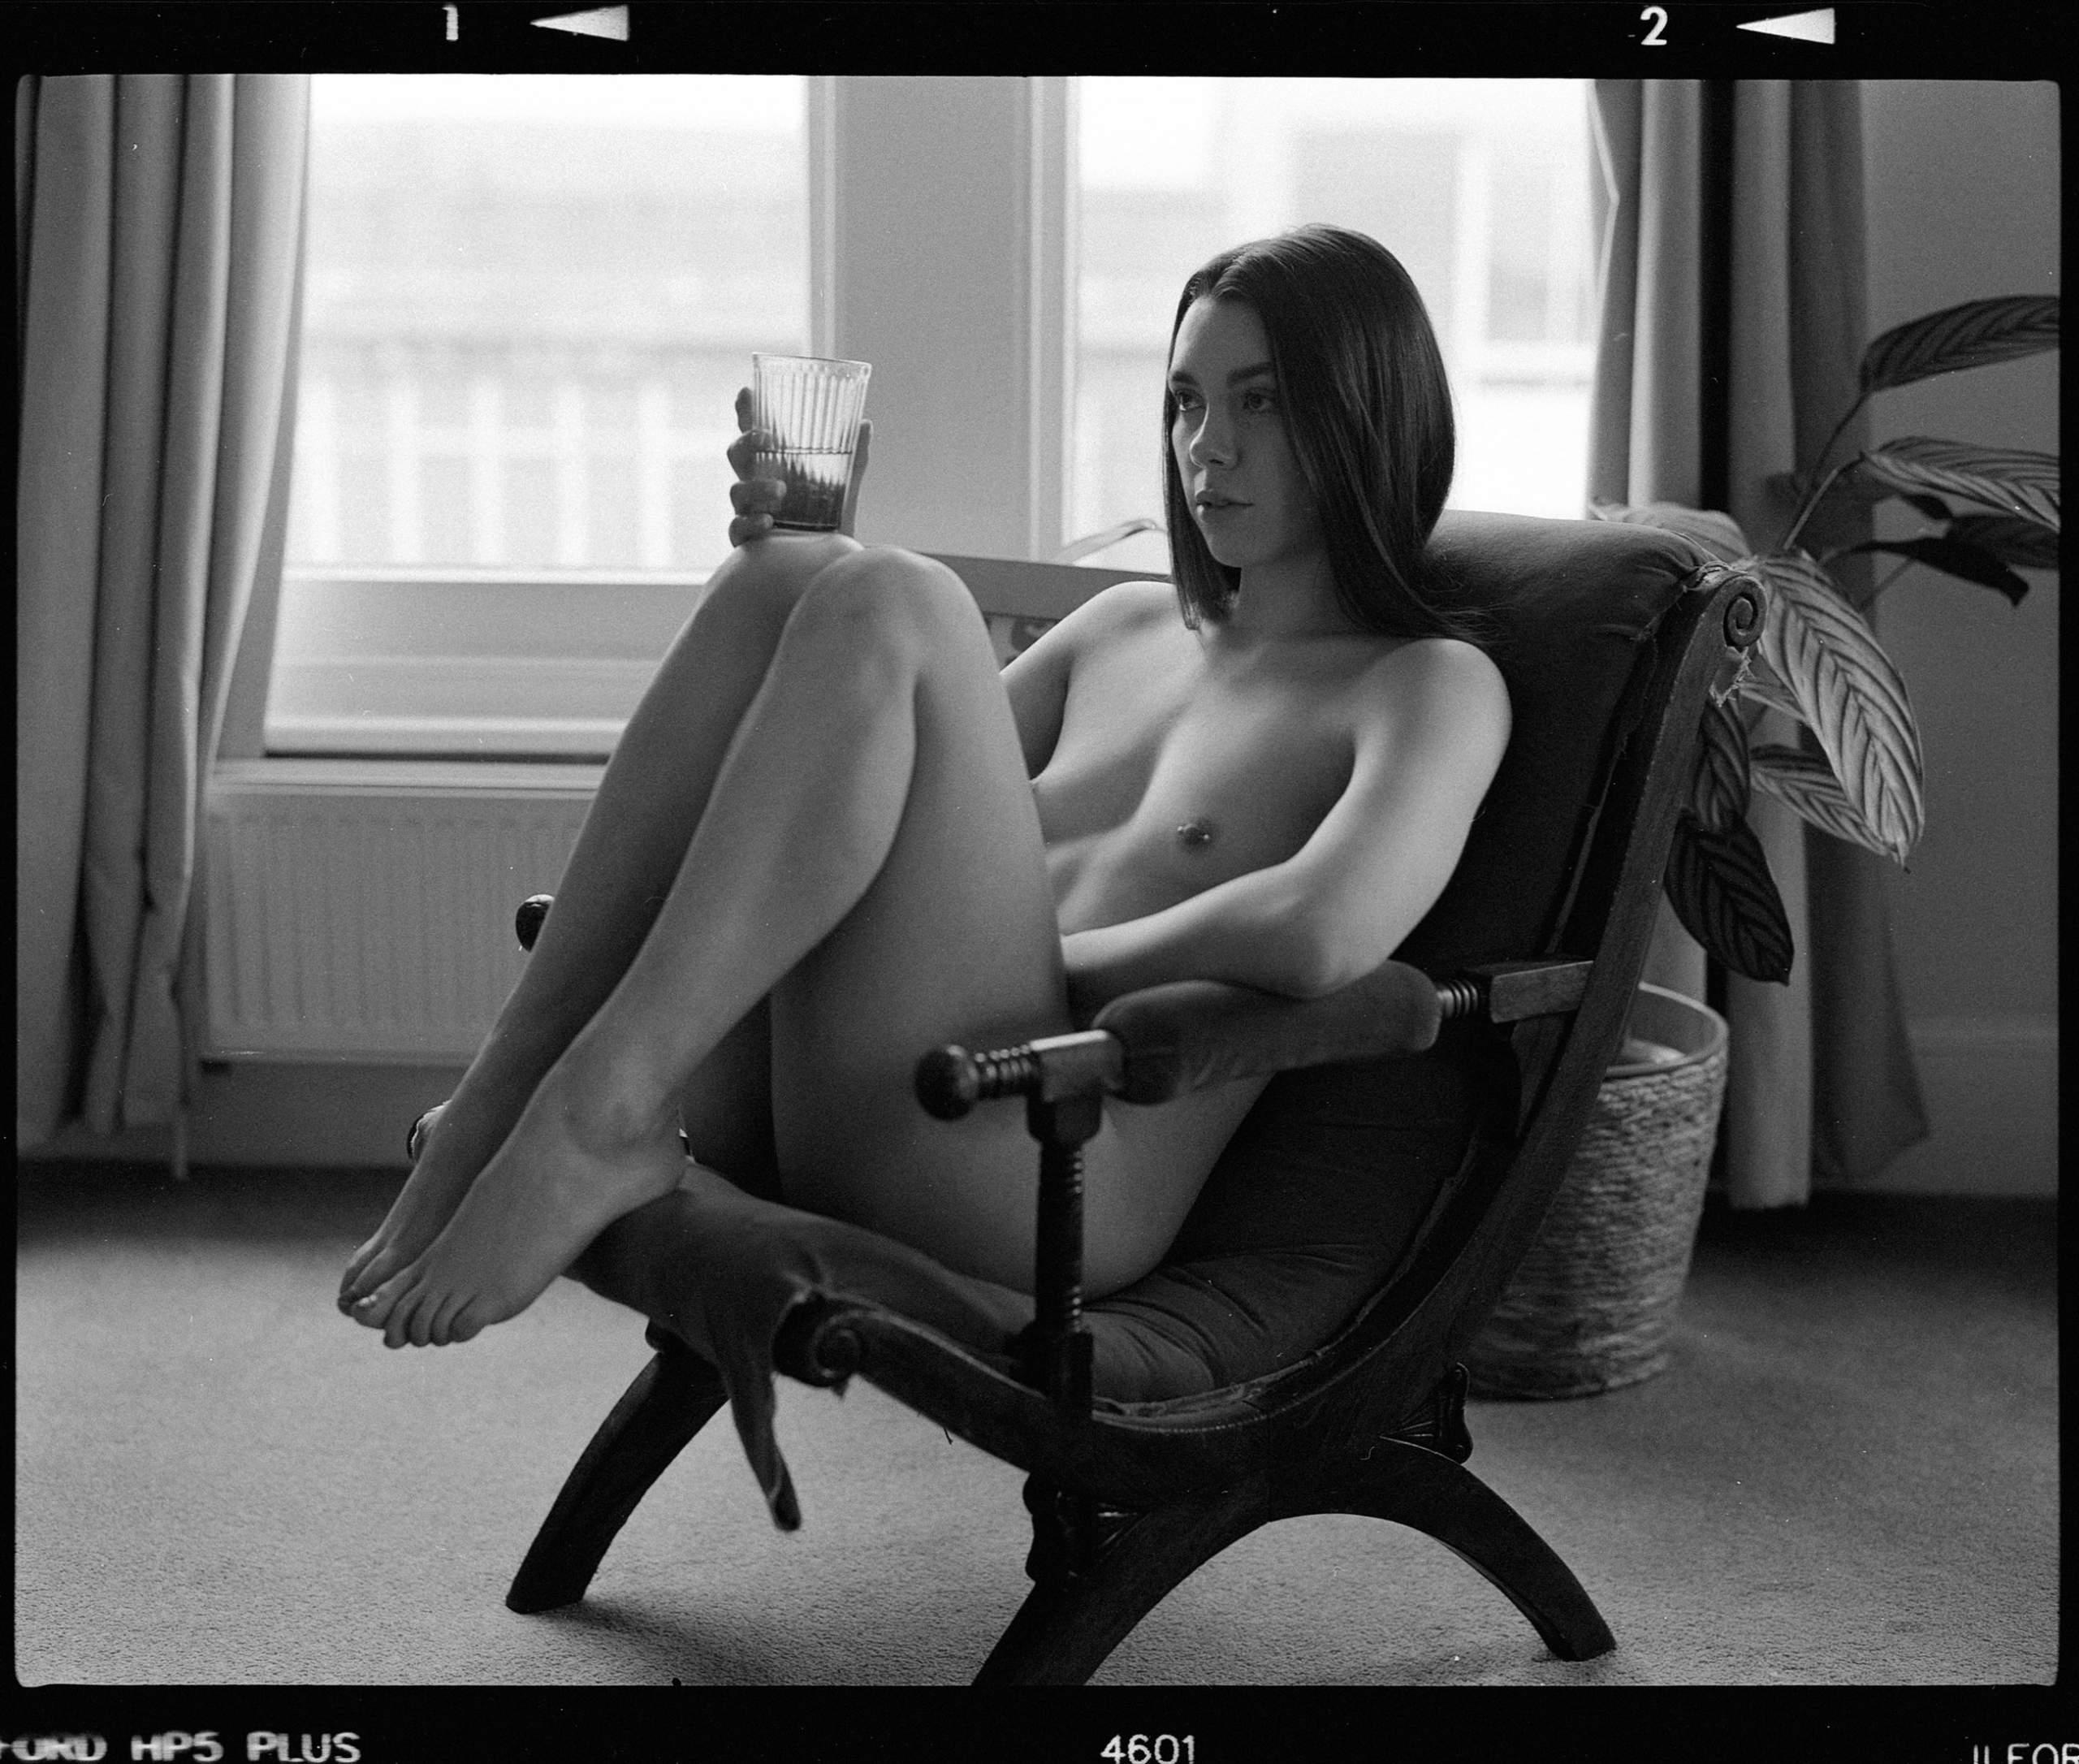 Hattie on nude art photography by Desari